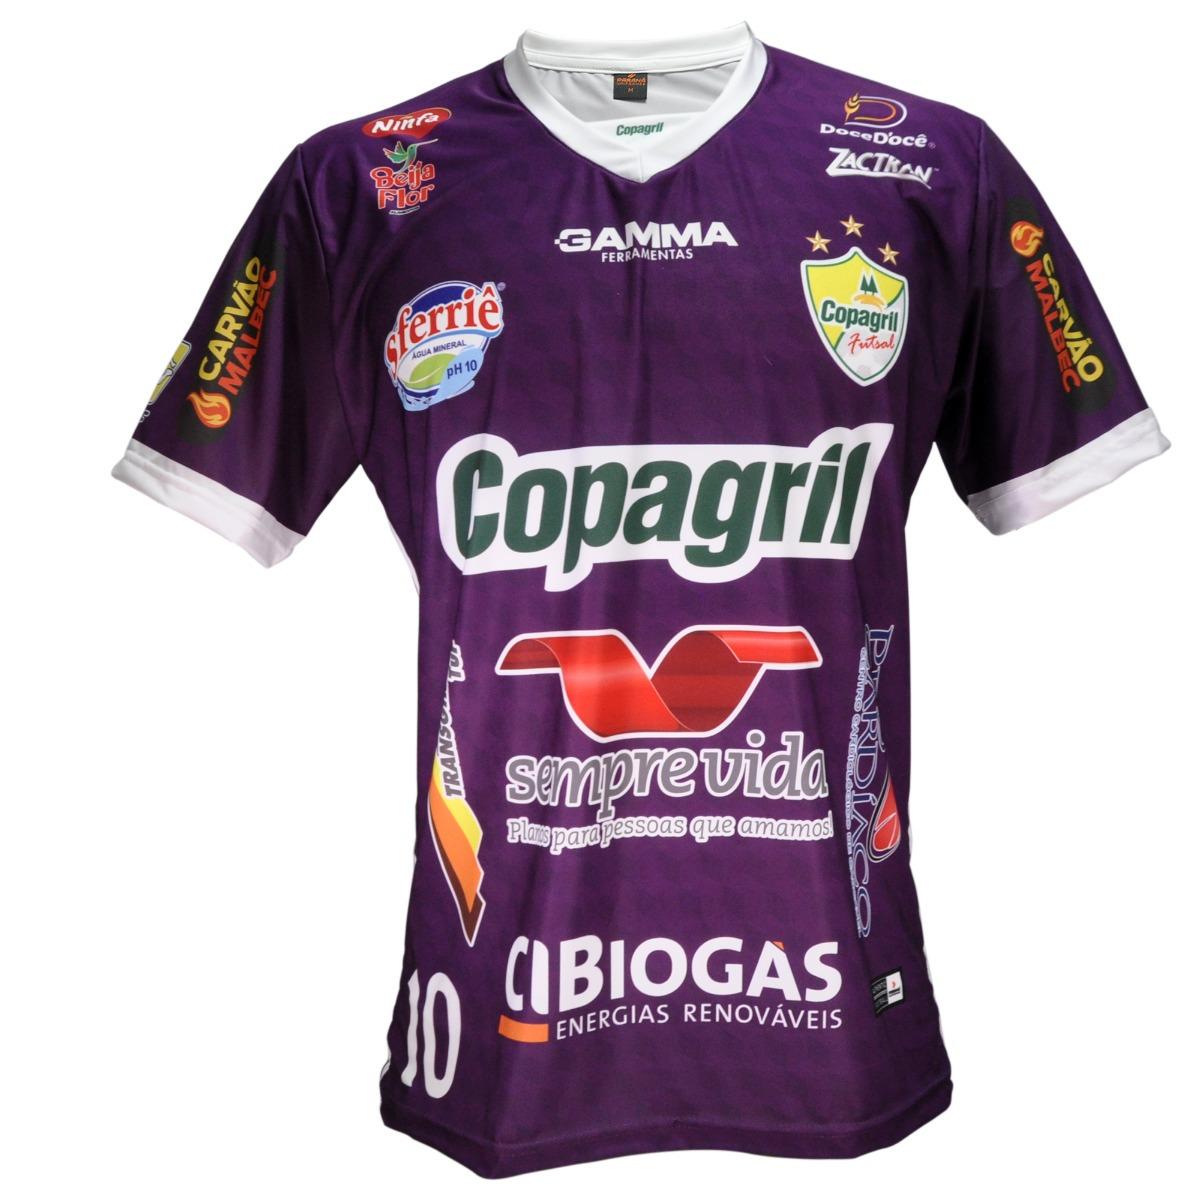 camisa masculina copagril futsal 2018 - paraná uniformes. Carregando zoom. 8b2499d8e1c8e